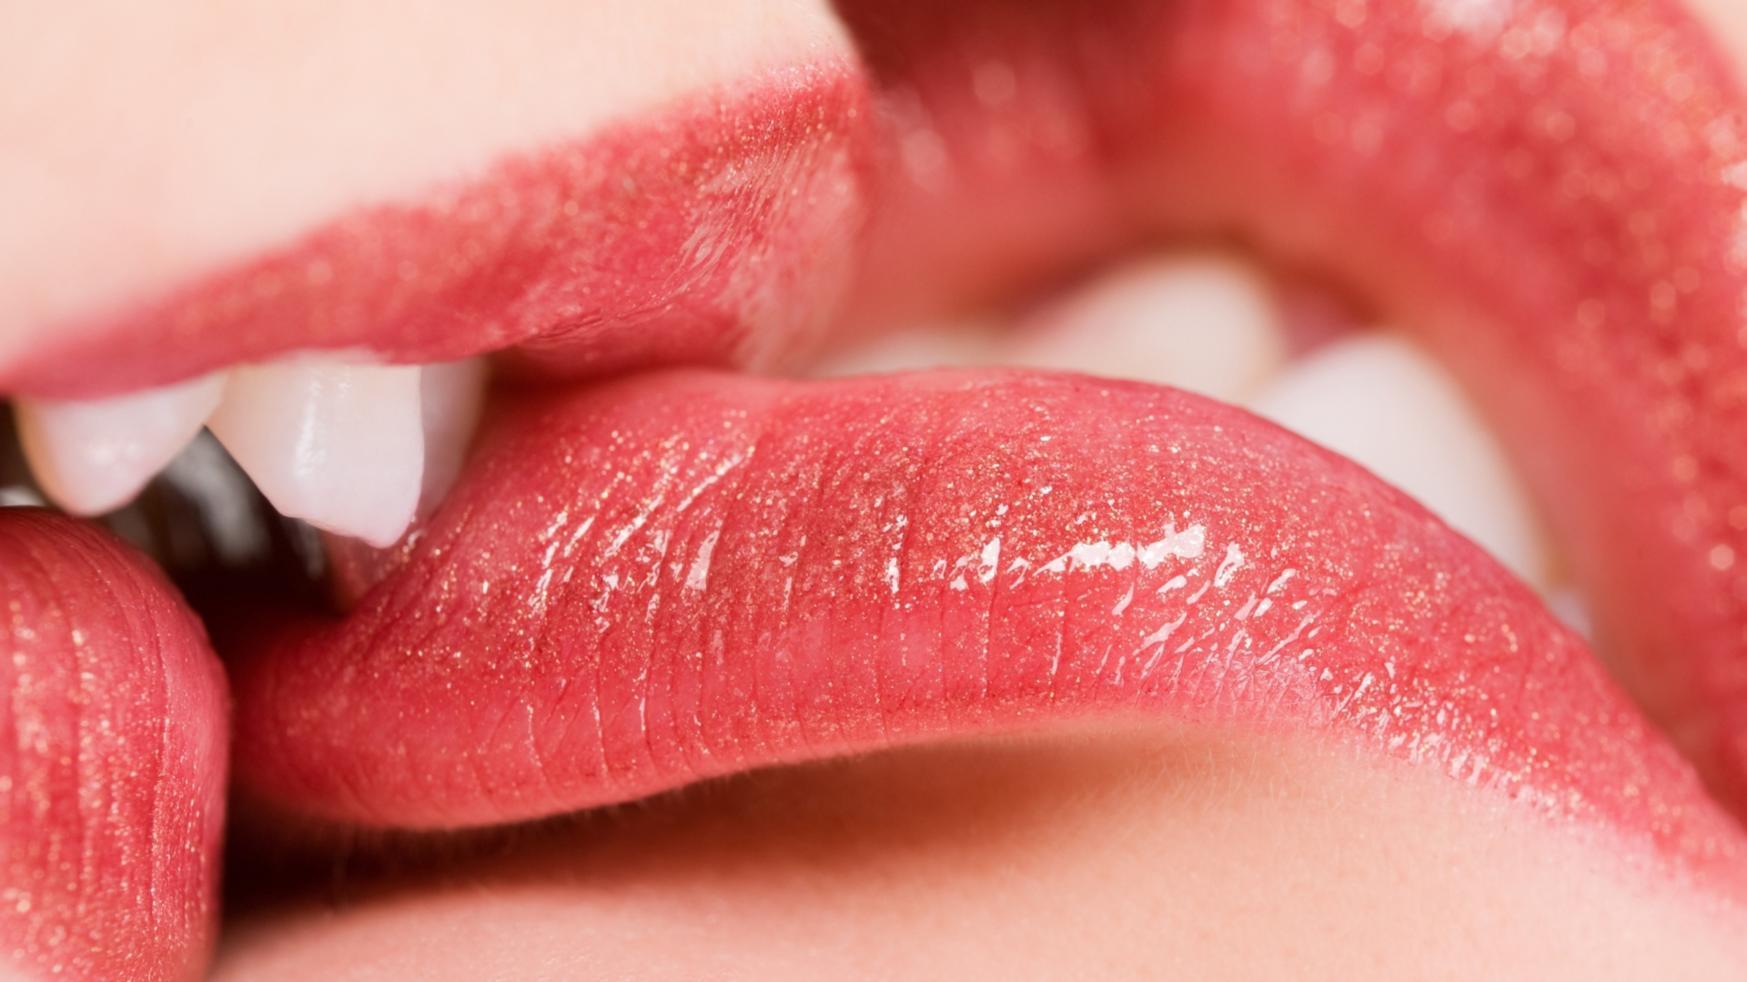 Best 37 Kissing Lips Backgrounds on HipWallpaper Wreck It Ralph 1747x982